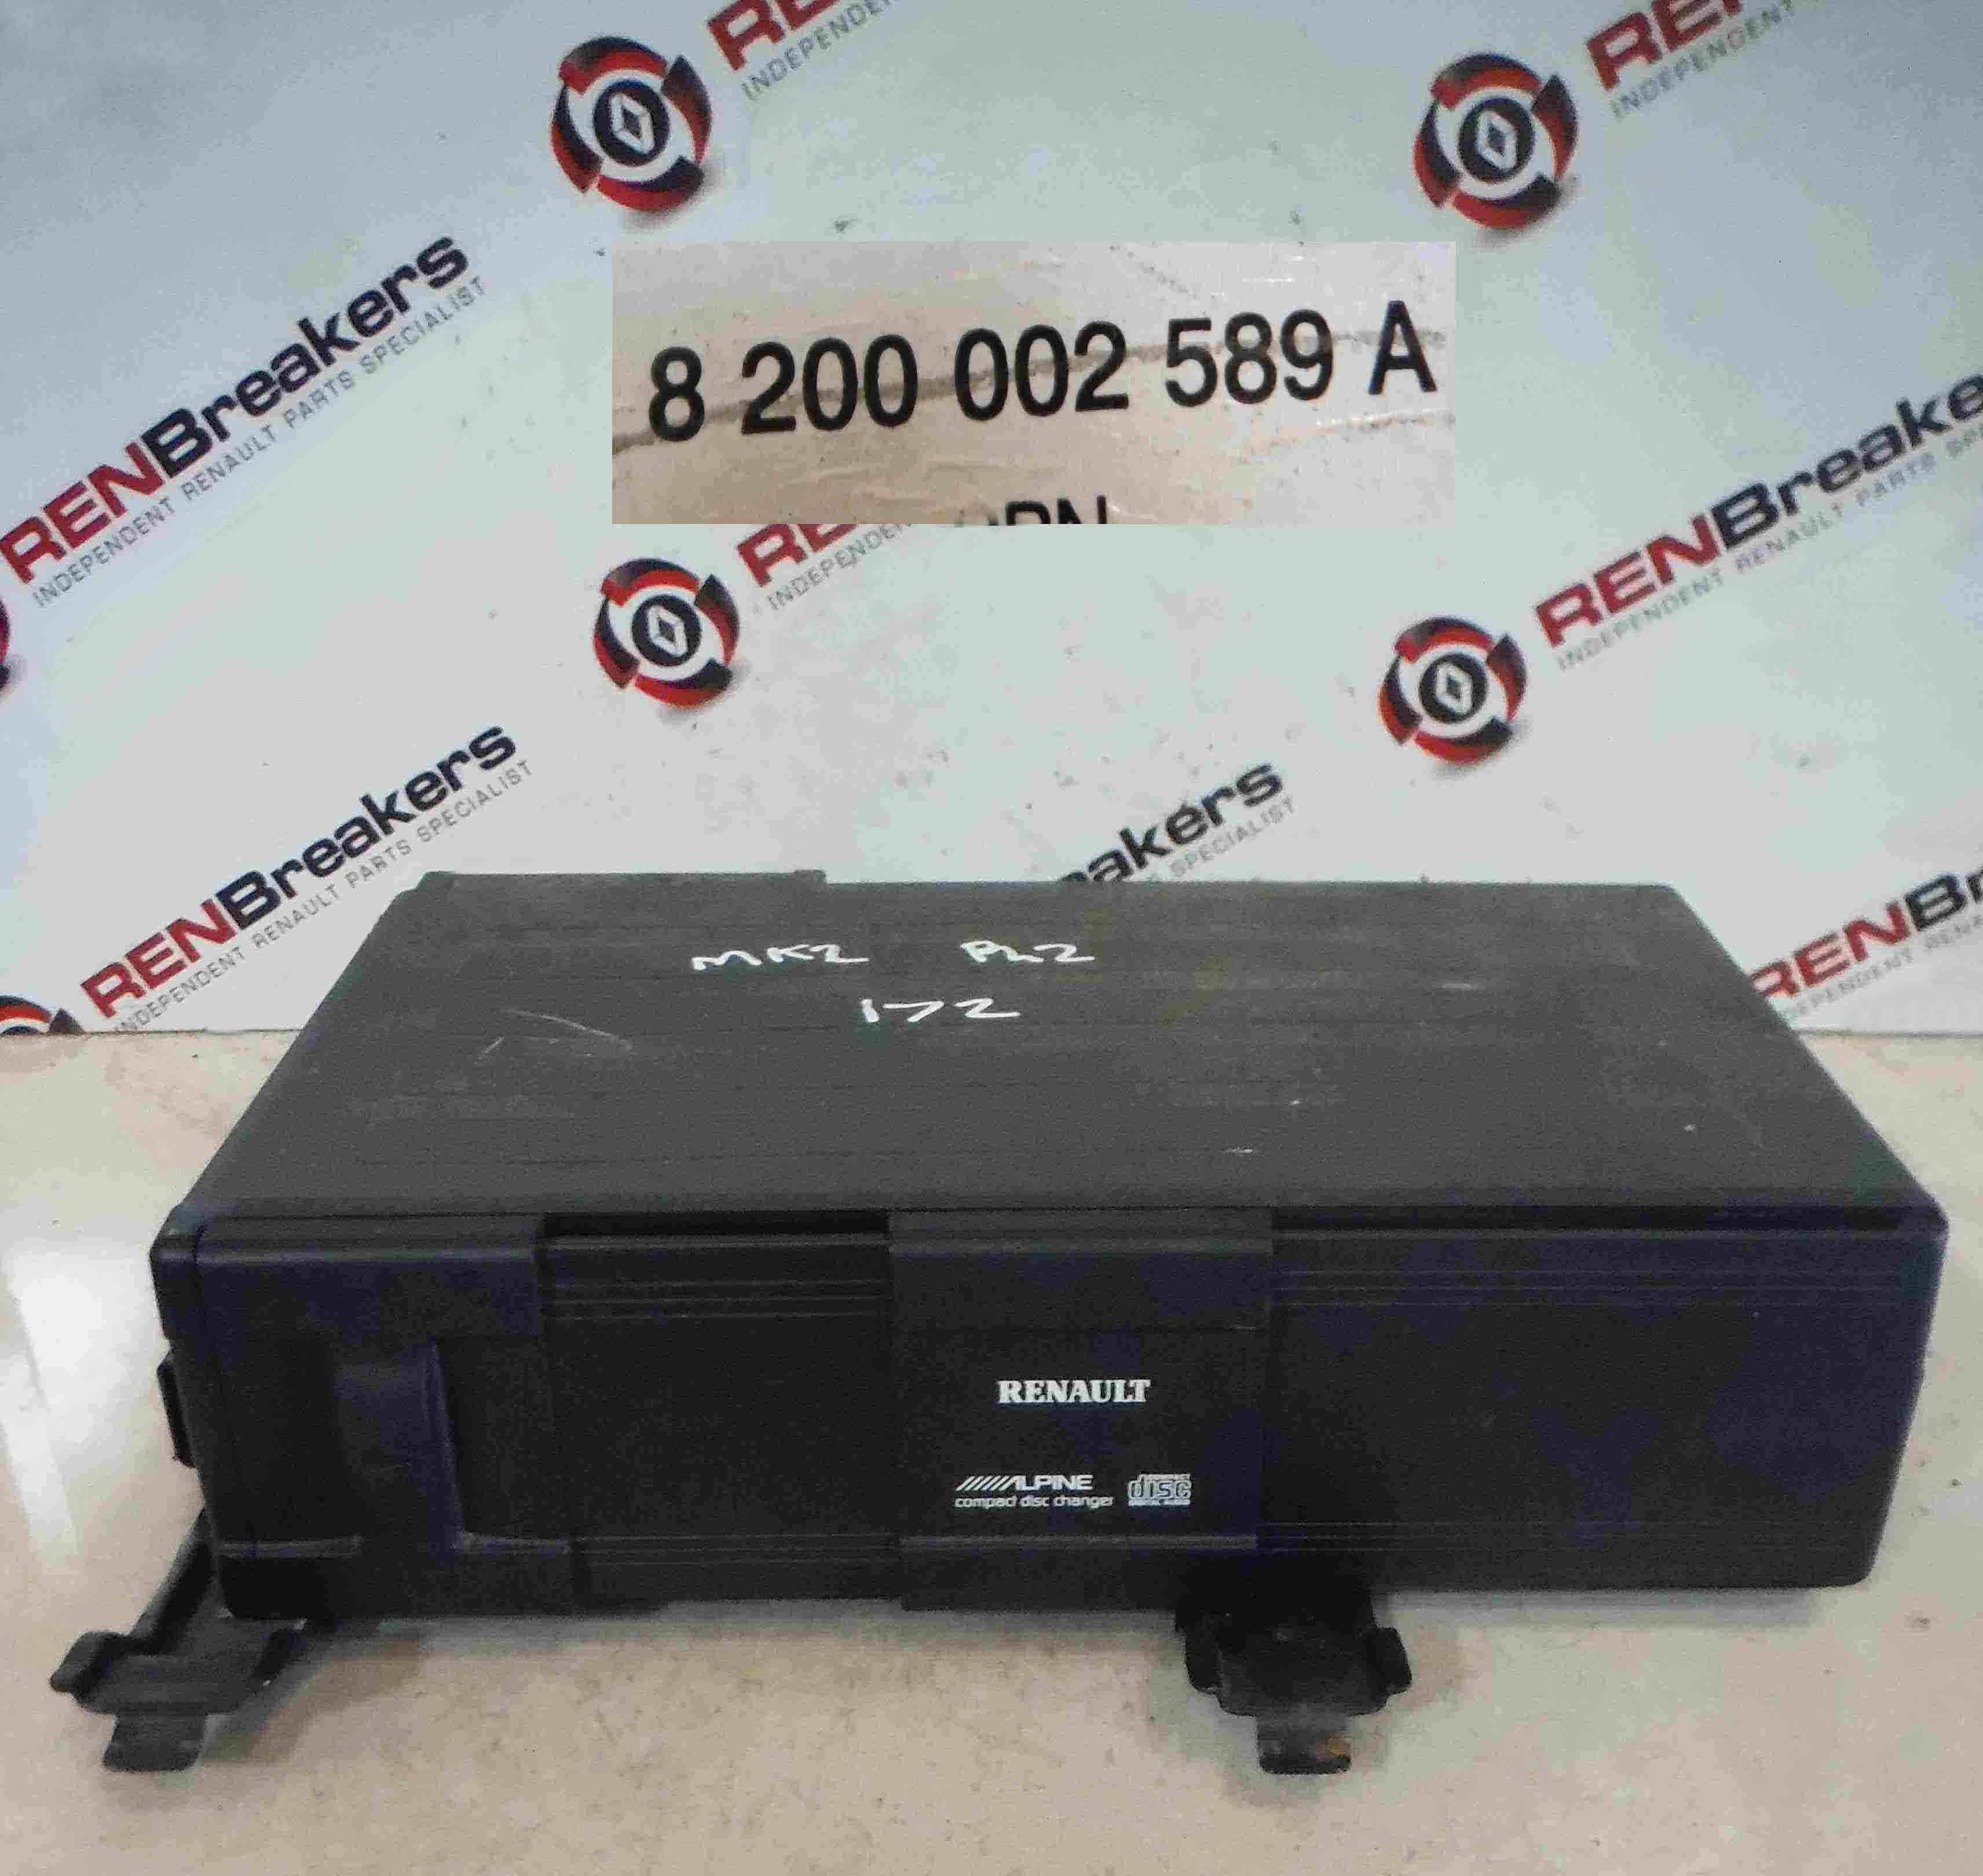 Renault Megane Scenic 2003-2009 CD Multi Changer Disk Player 8200002589